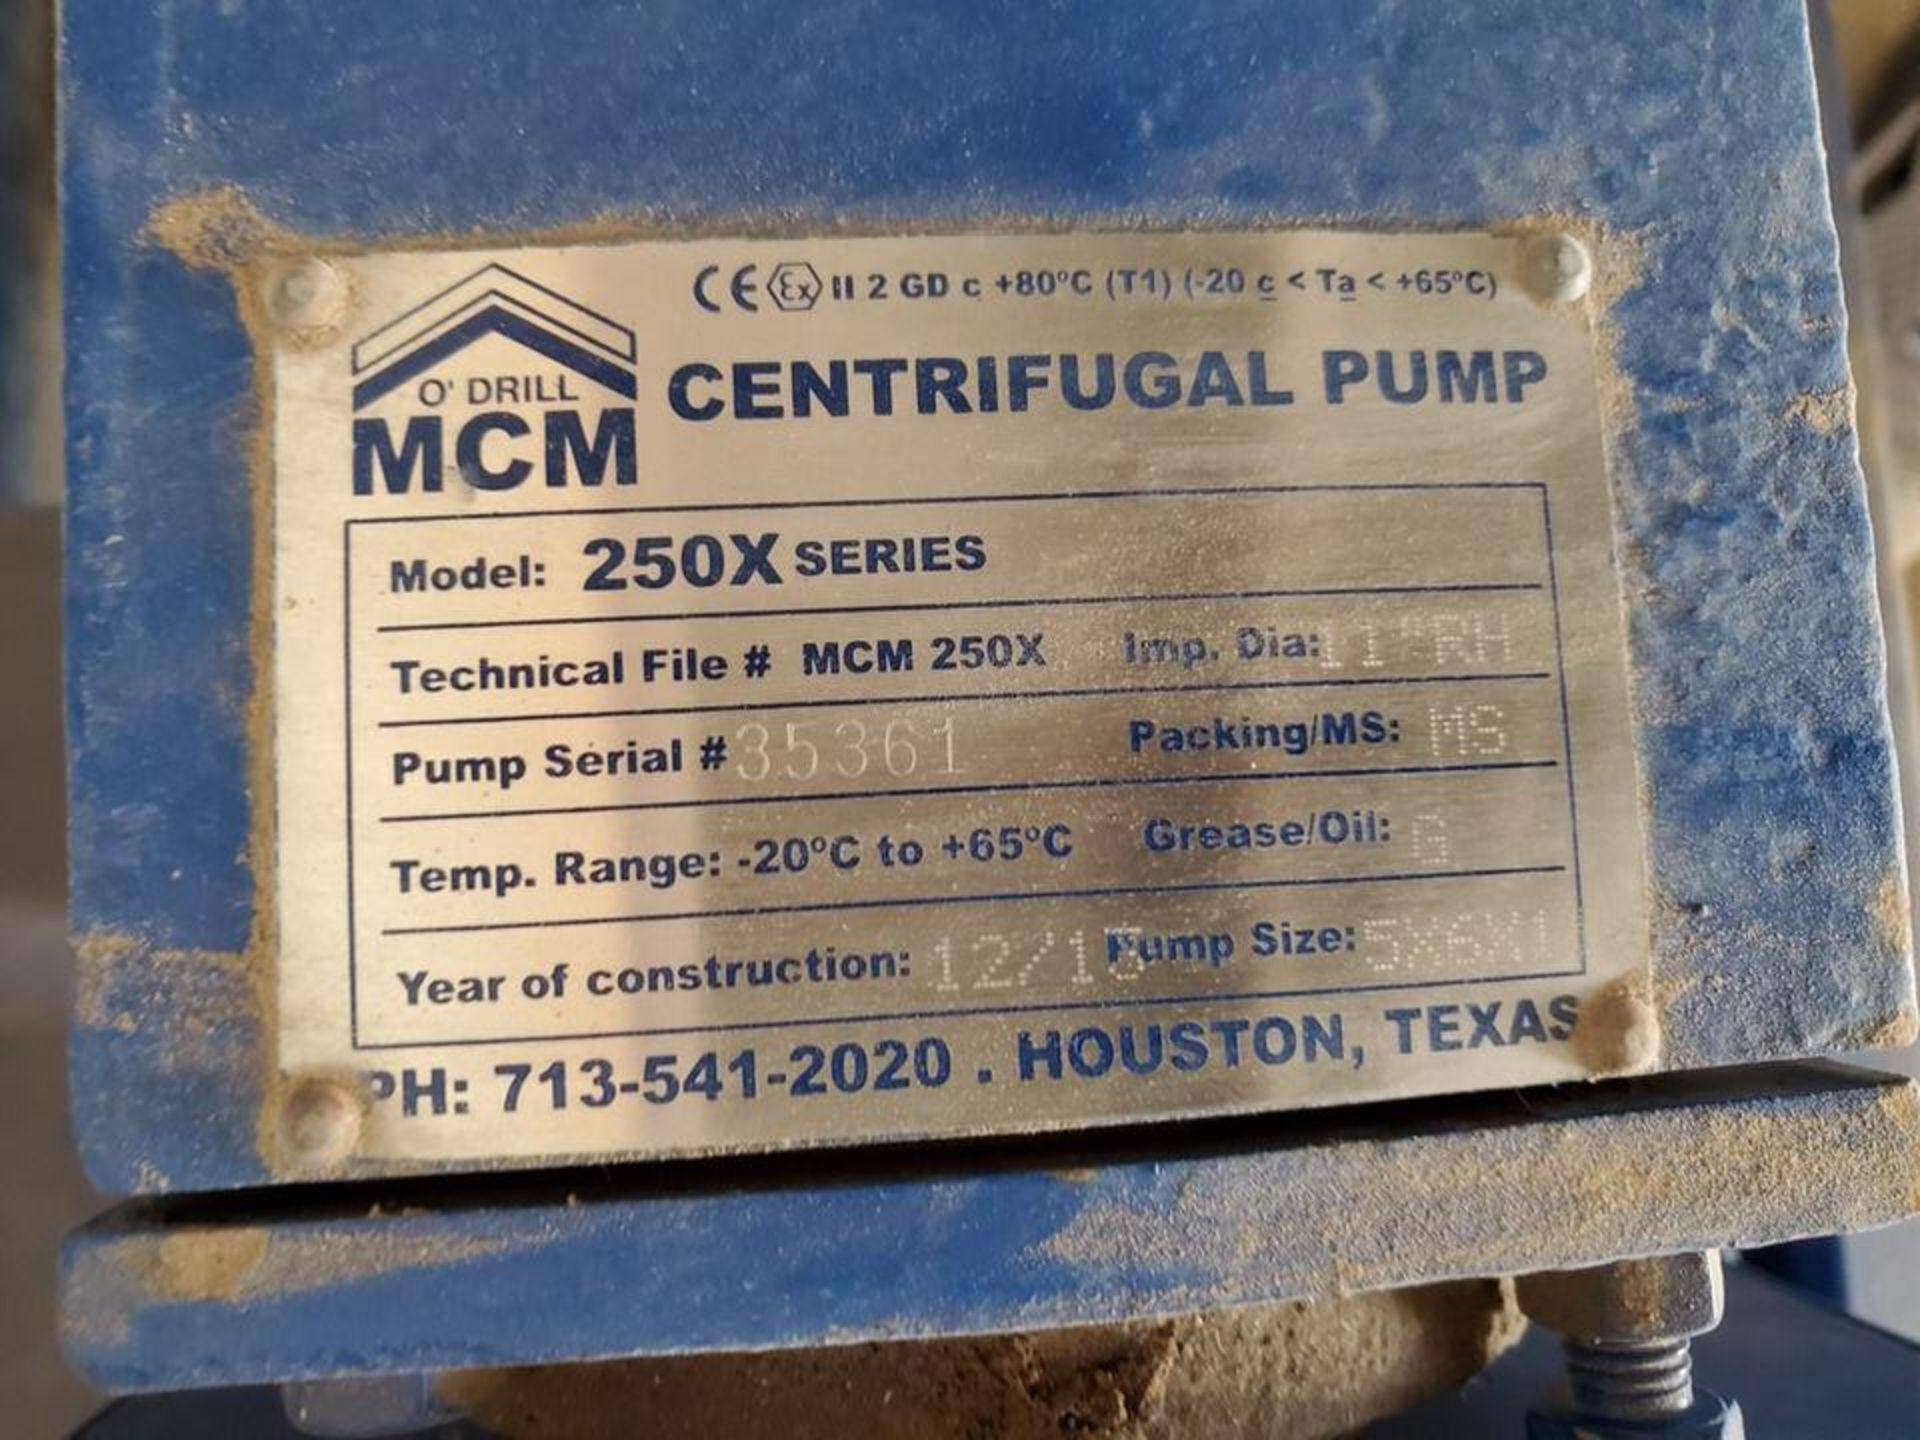 "2013 Ace 250X Series 5x6x1 Centrifugal Pump Imp Dia: 11"" RH, -20C-65C; W/ 75HP Weg Motor, 1780RPM, - Image 6 of 7"